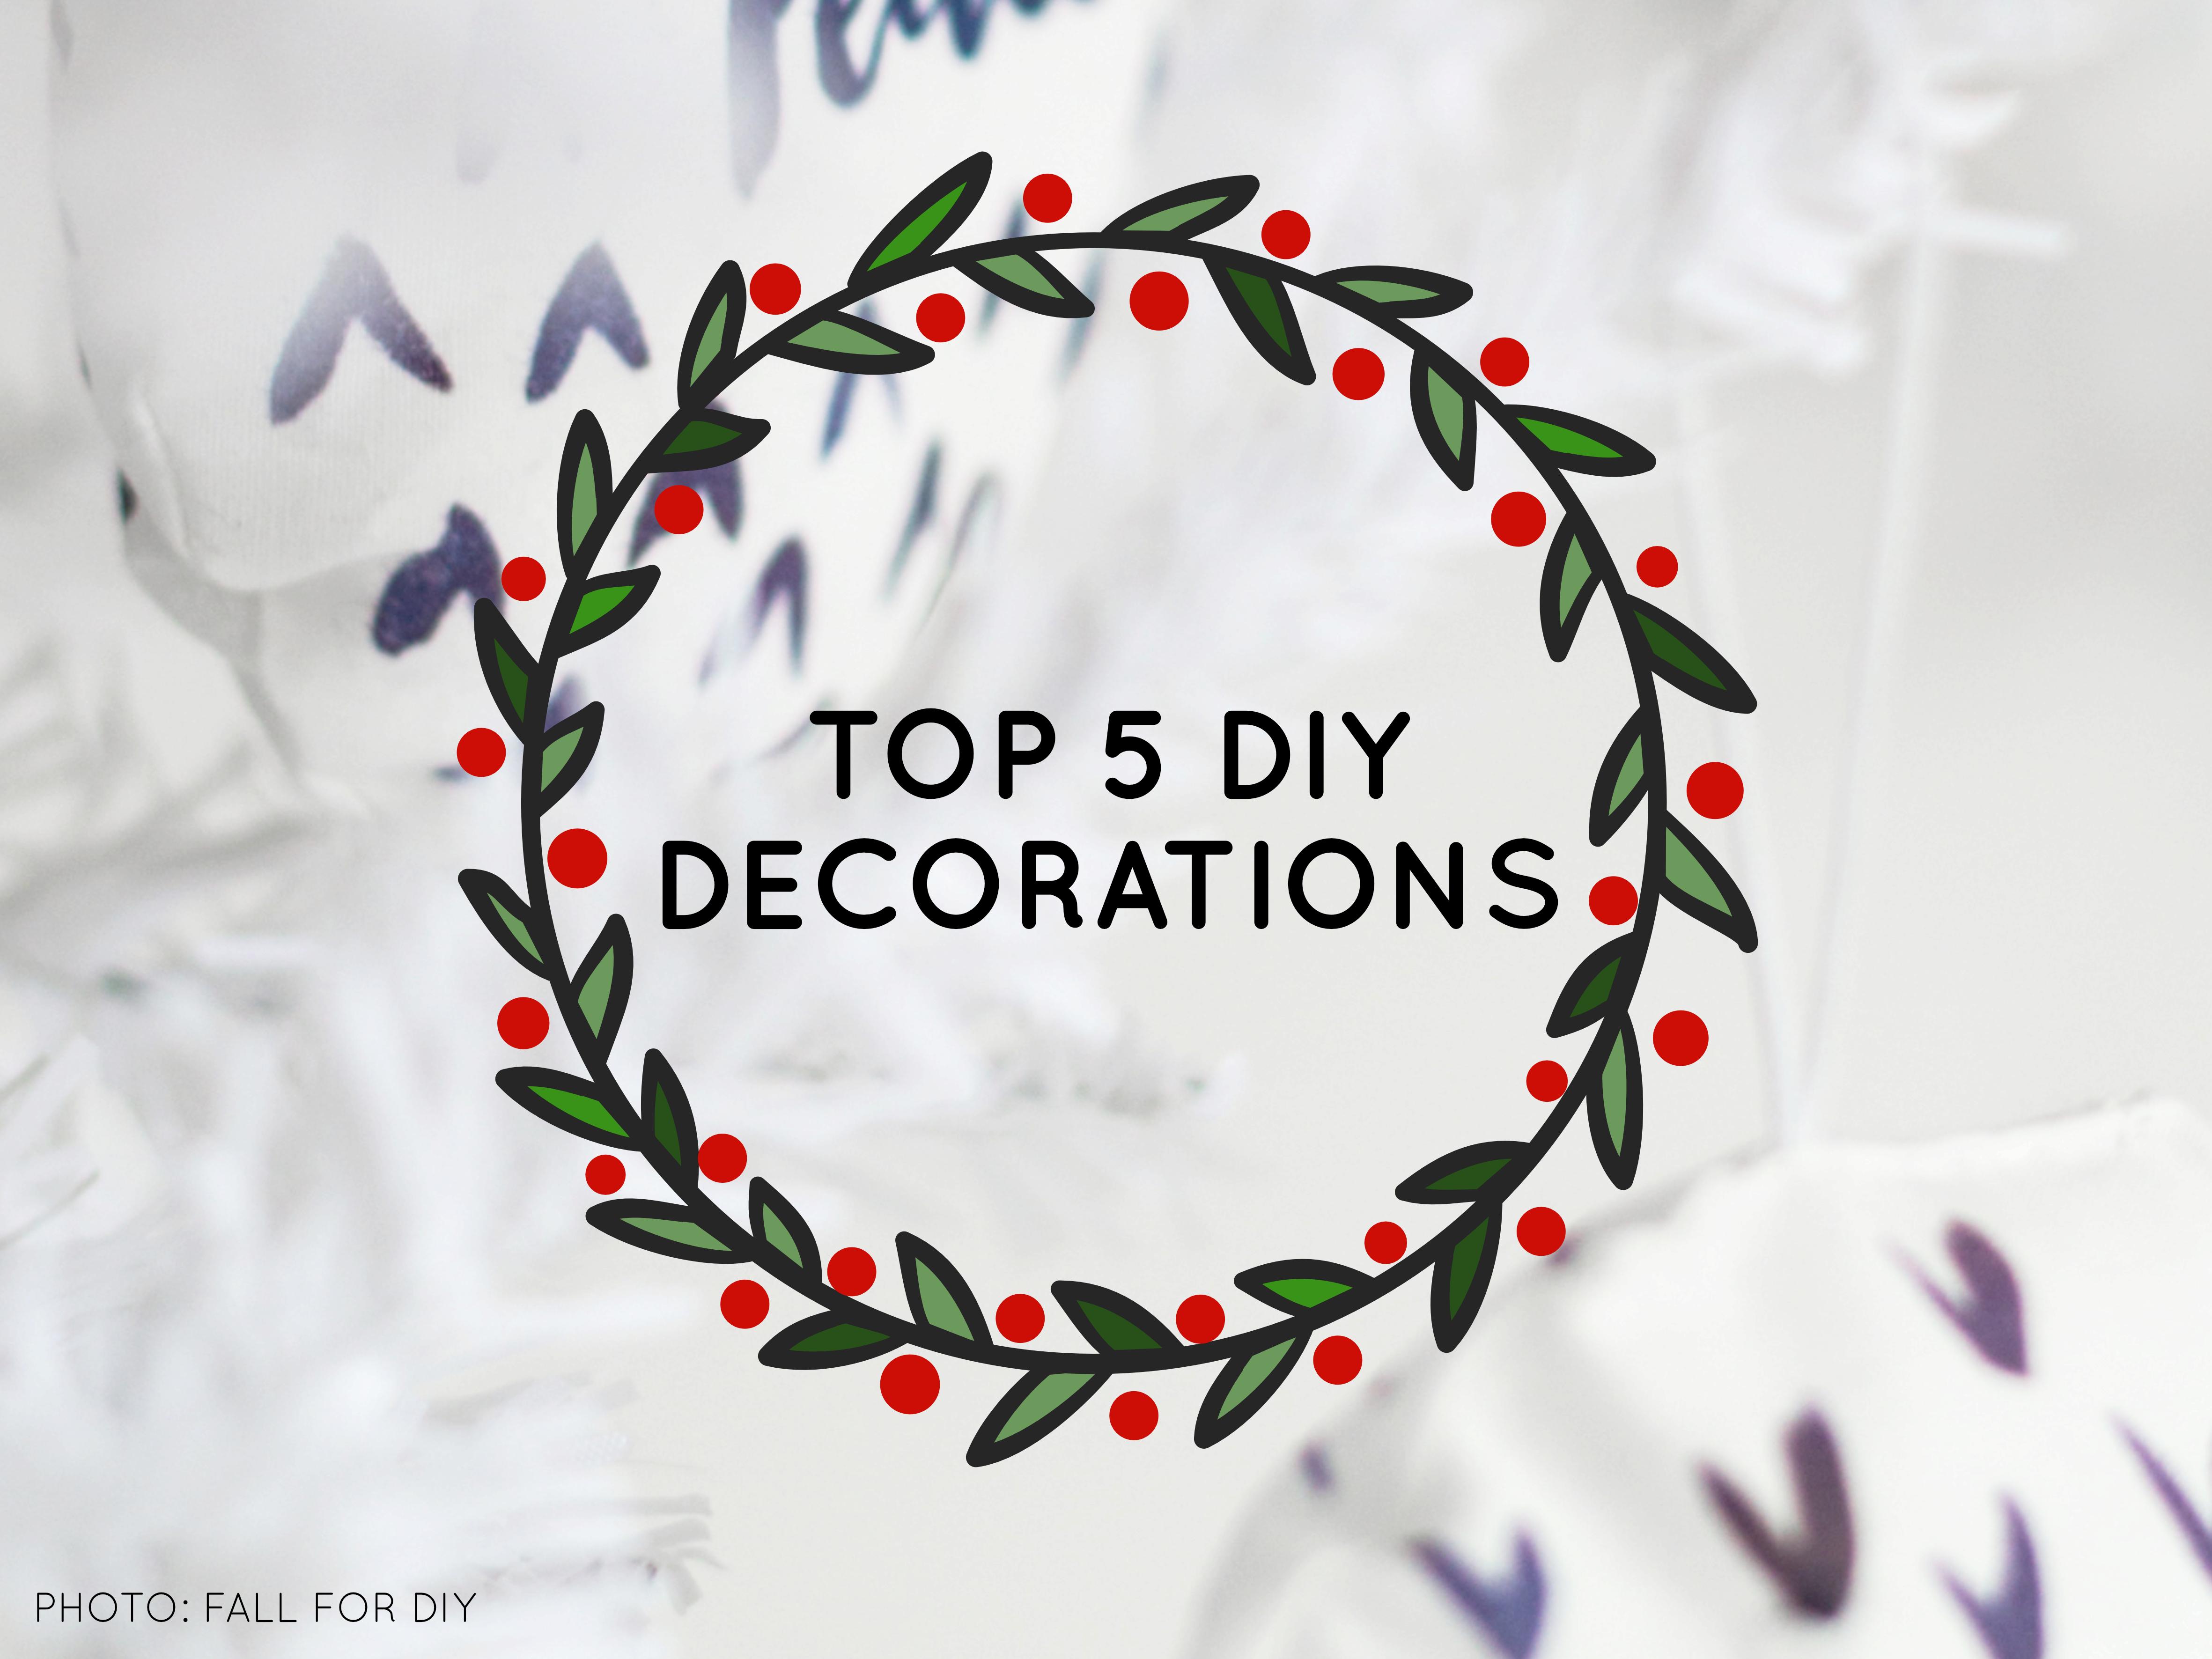 Top 5 DIY christmas decorations